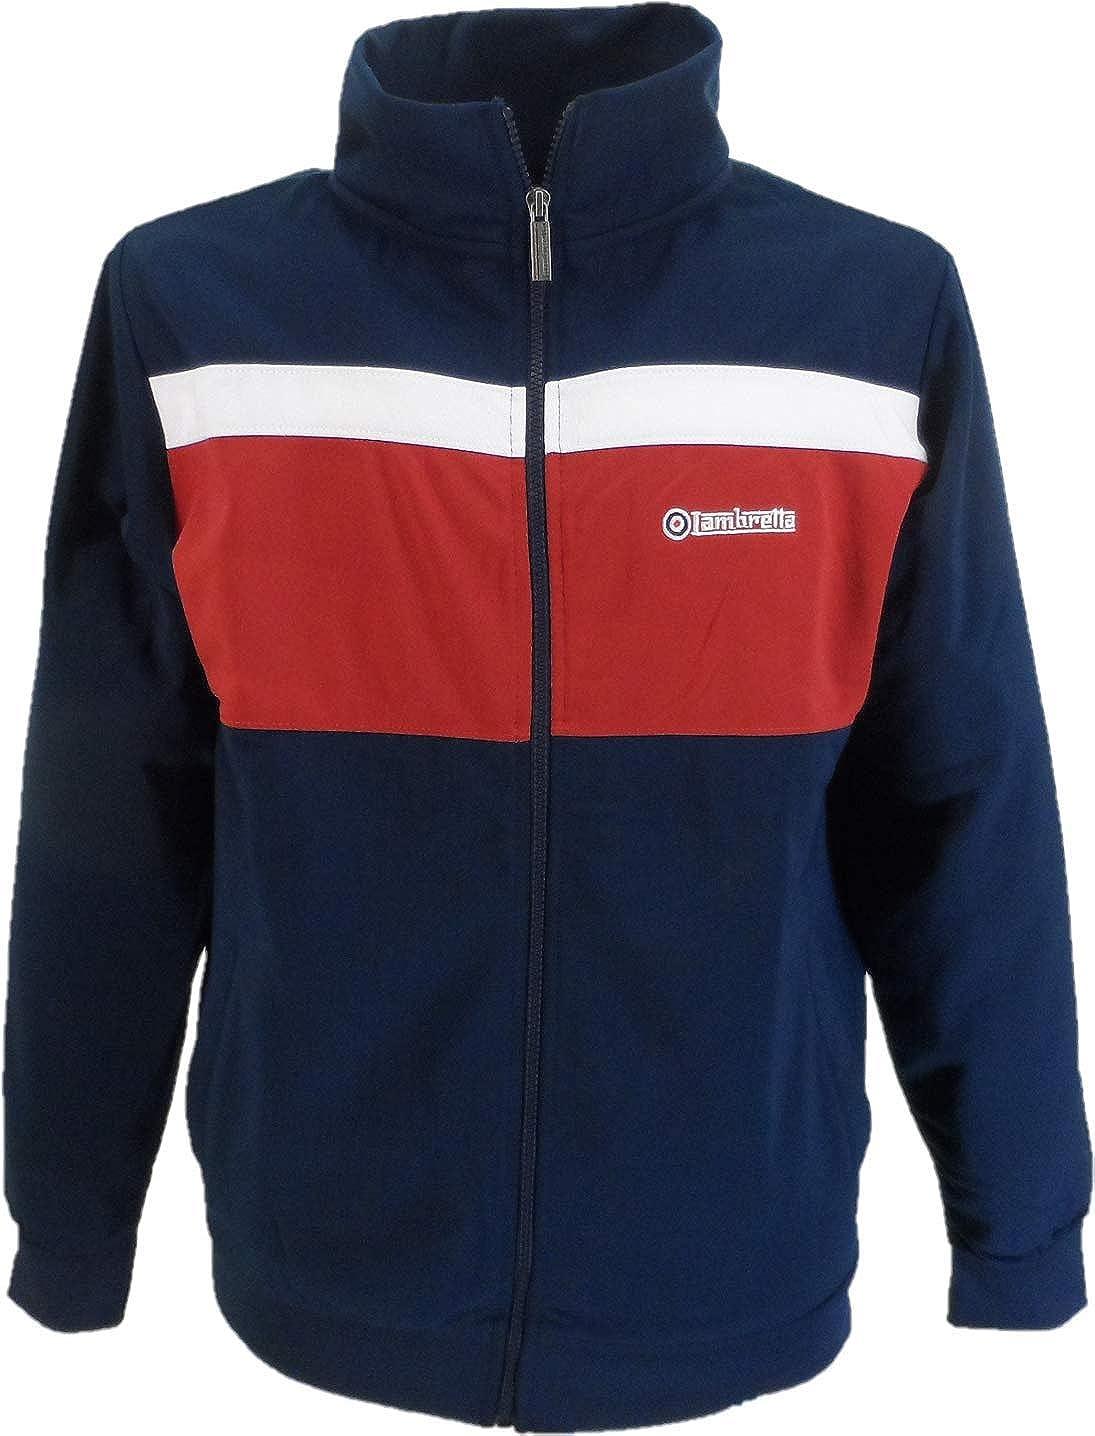 Lambretta Retro Track Top//Jacket